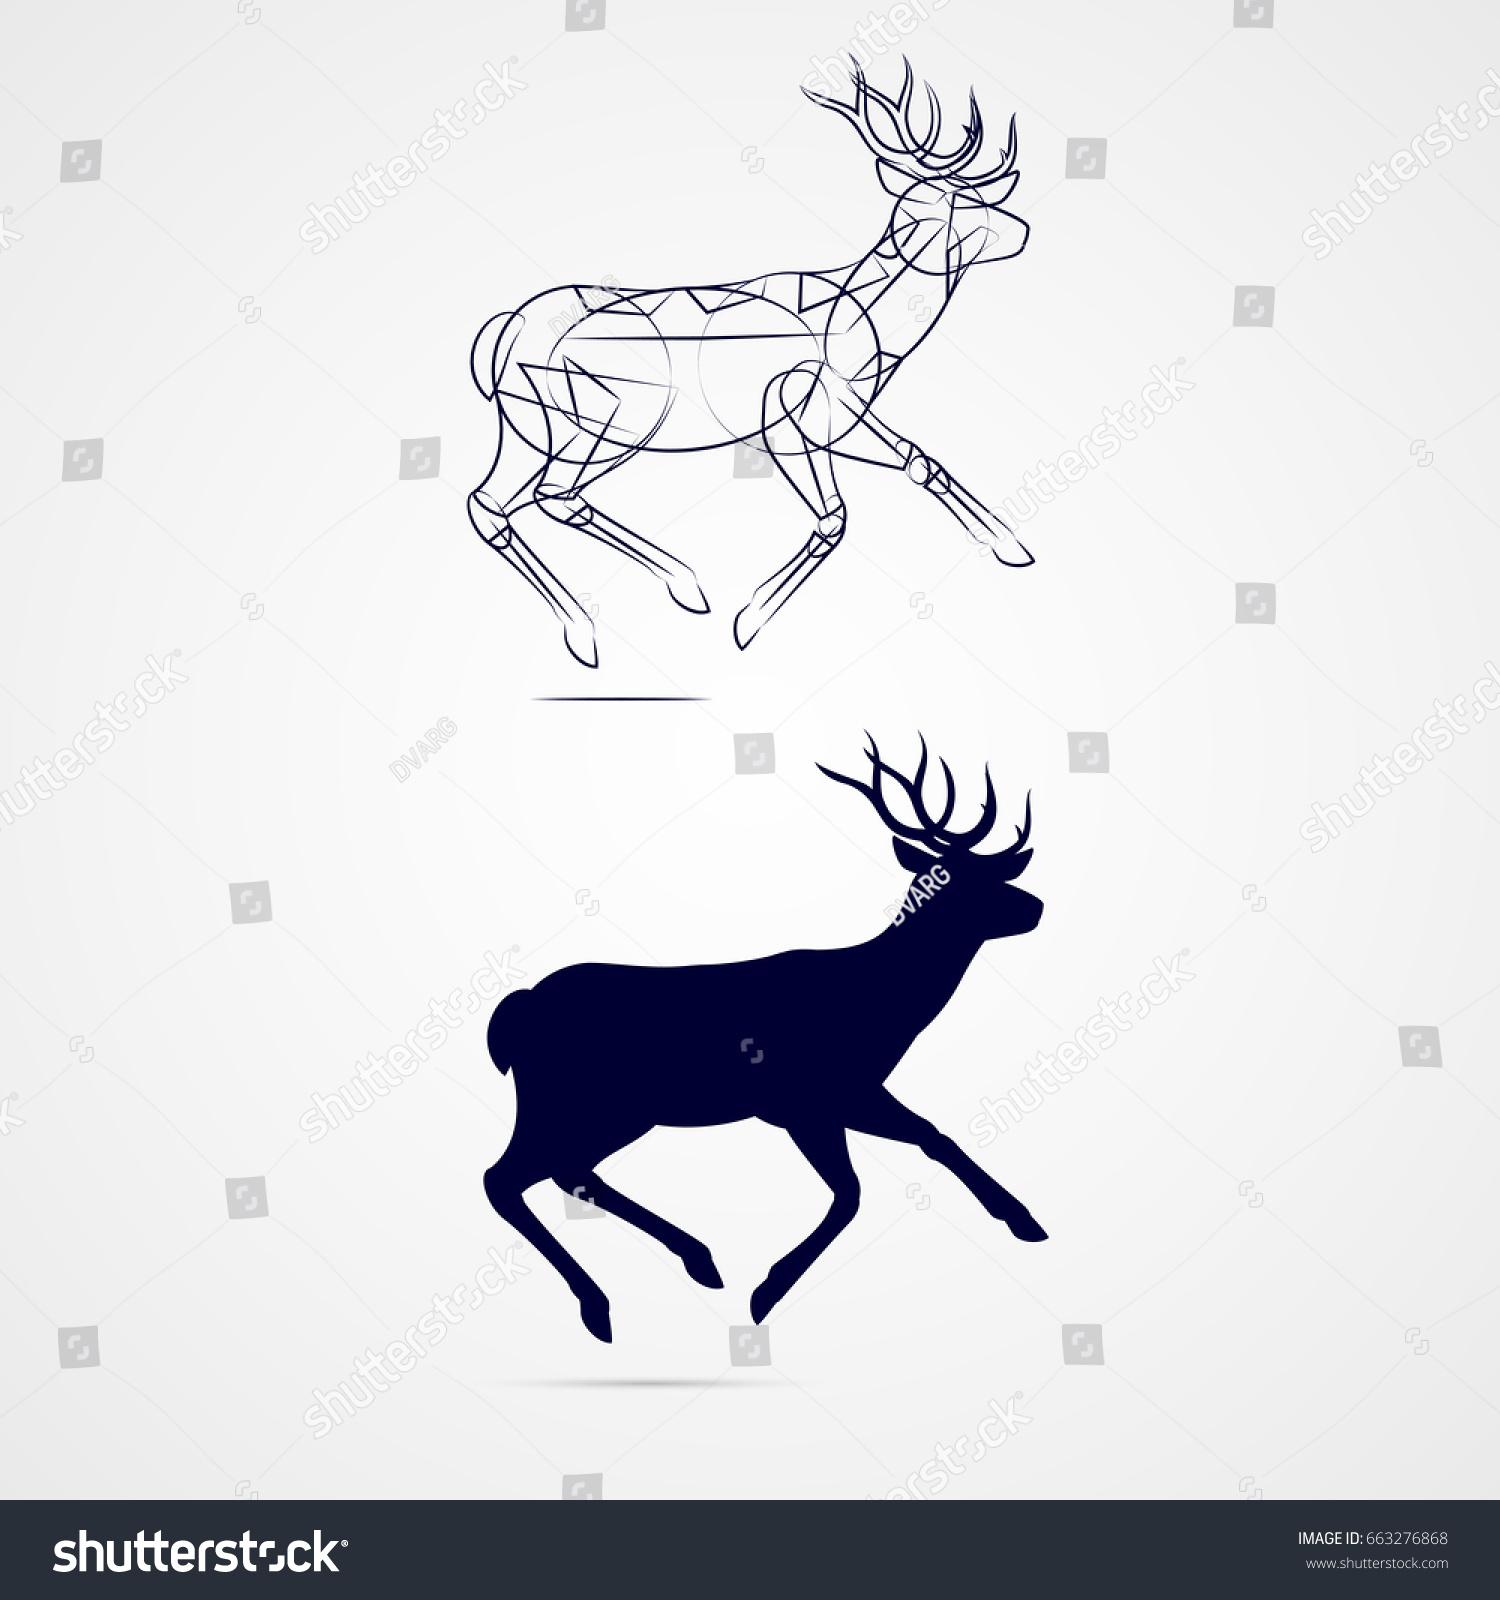 running horned deer silhouette sketch template stock vector